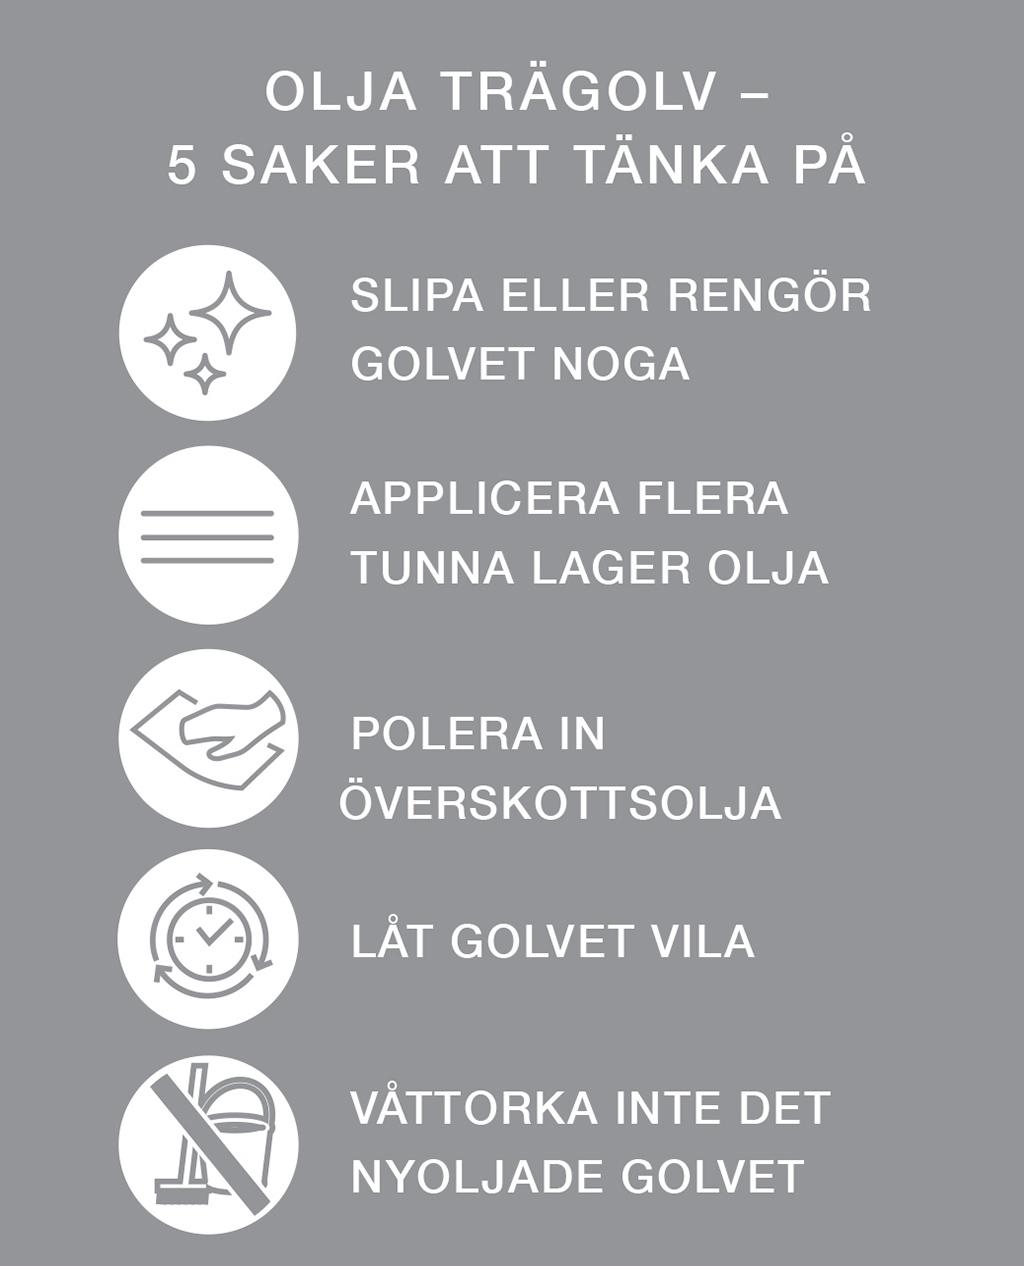 pergo-infographic-olja-tragolv